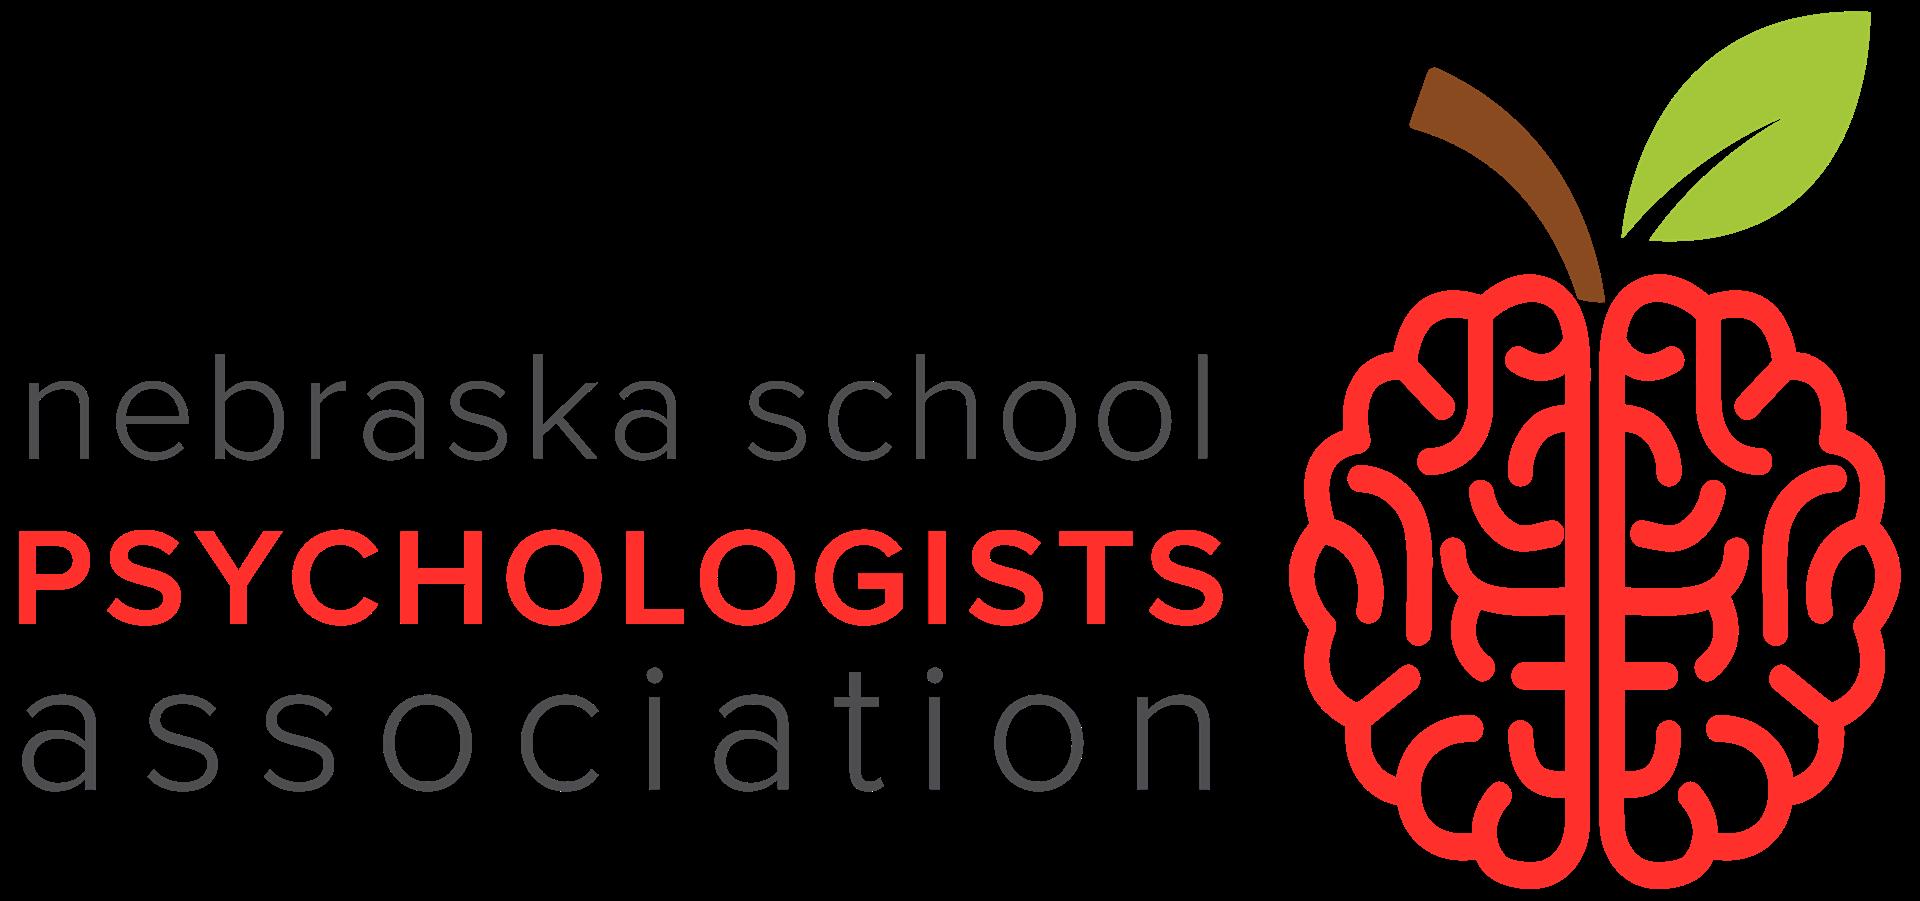 Nebraska School Psychologist Association - Job Opportunities